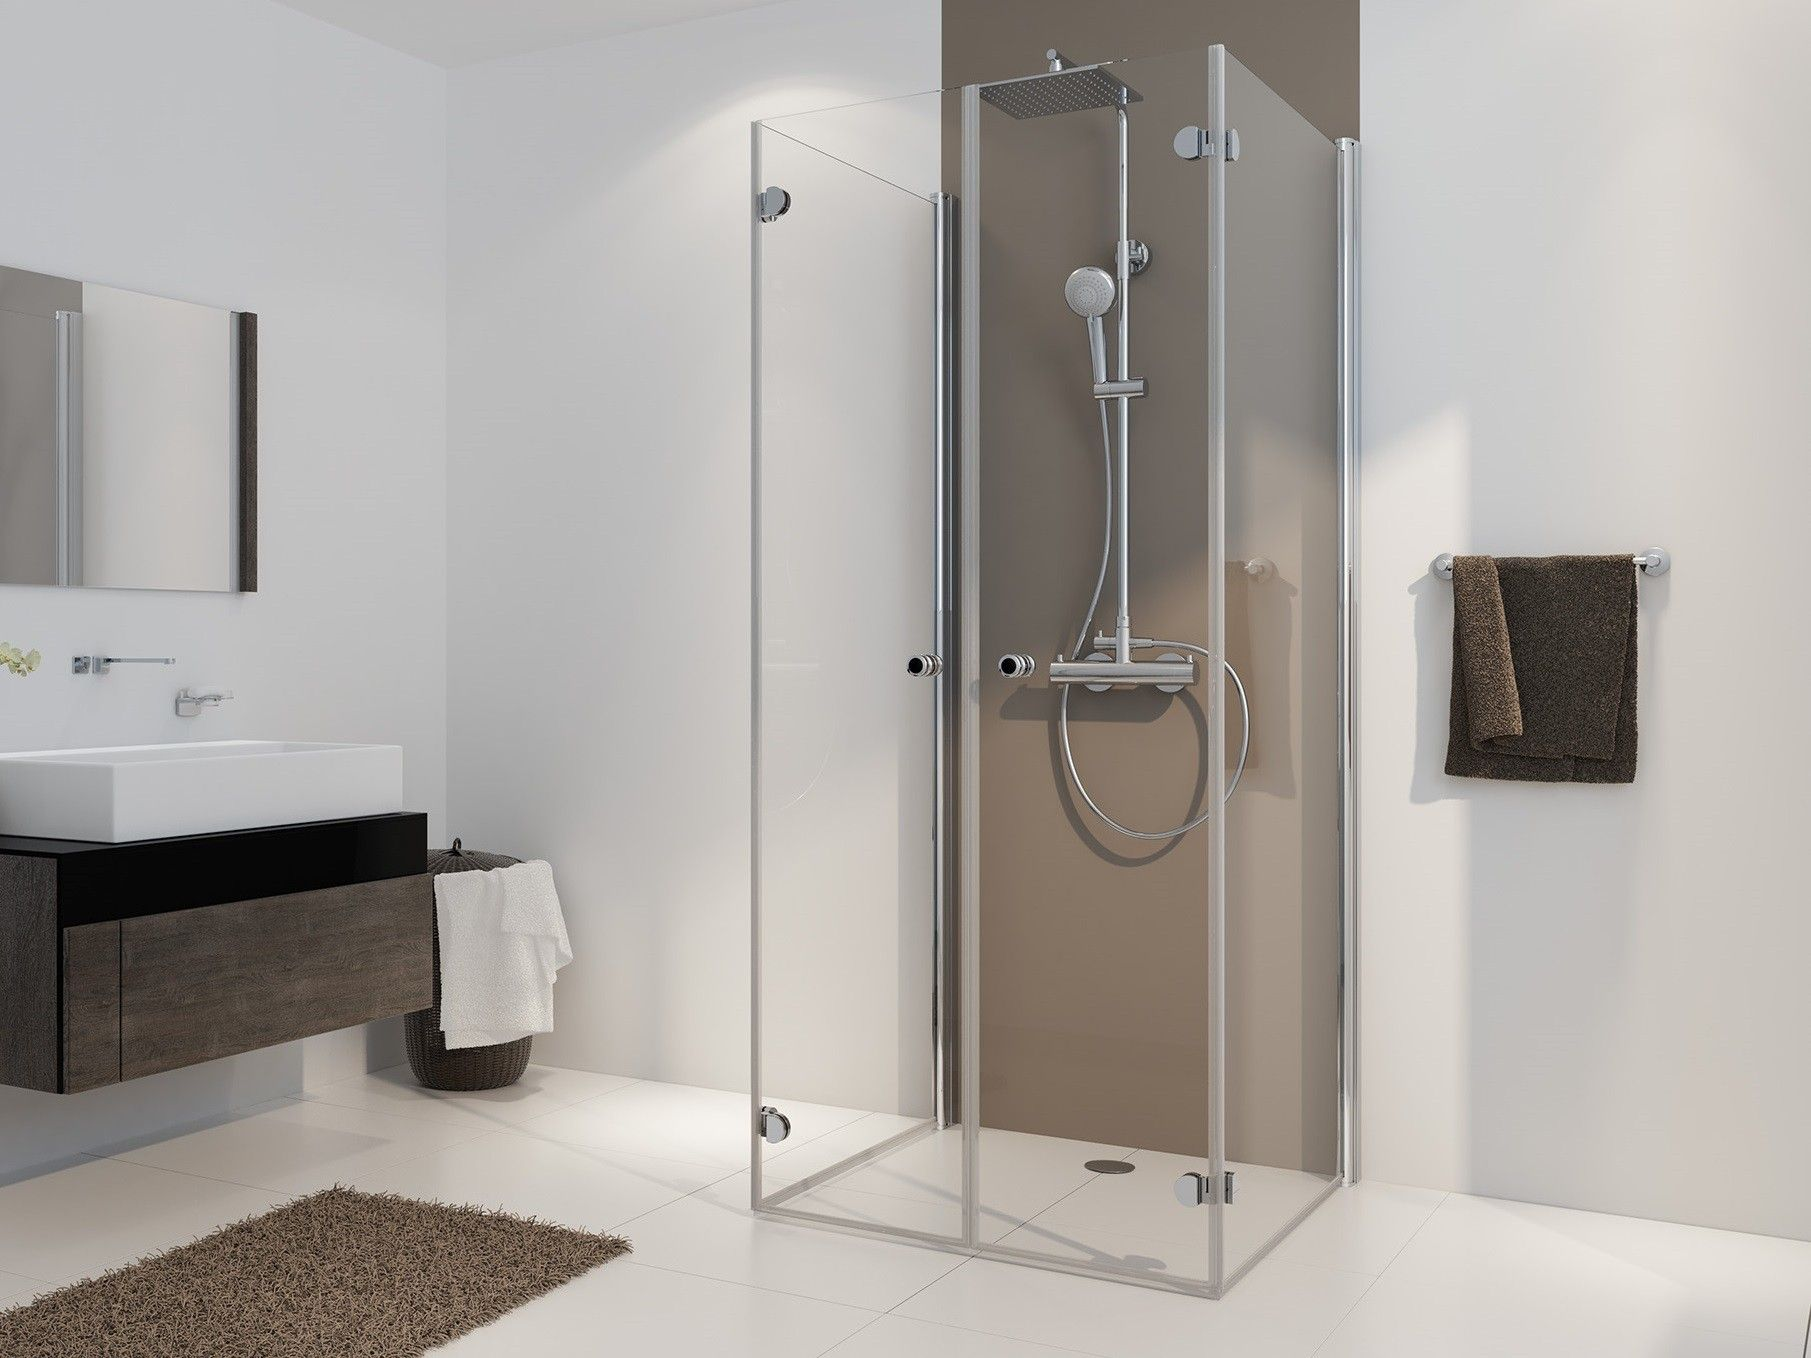 faltt r dusche u form ab 70 x 70 x 220 cm echtglas esg klar hell 6 mm wandprofil alu silber. Black Bedroom Furniture Sets. Home Design Ideas